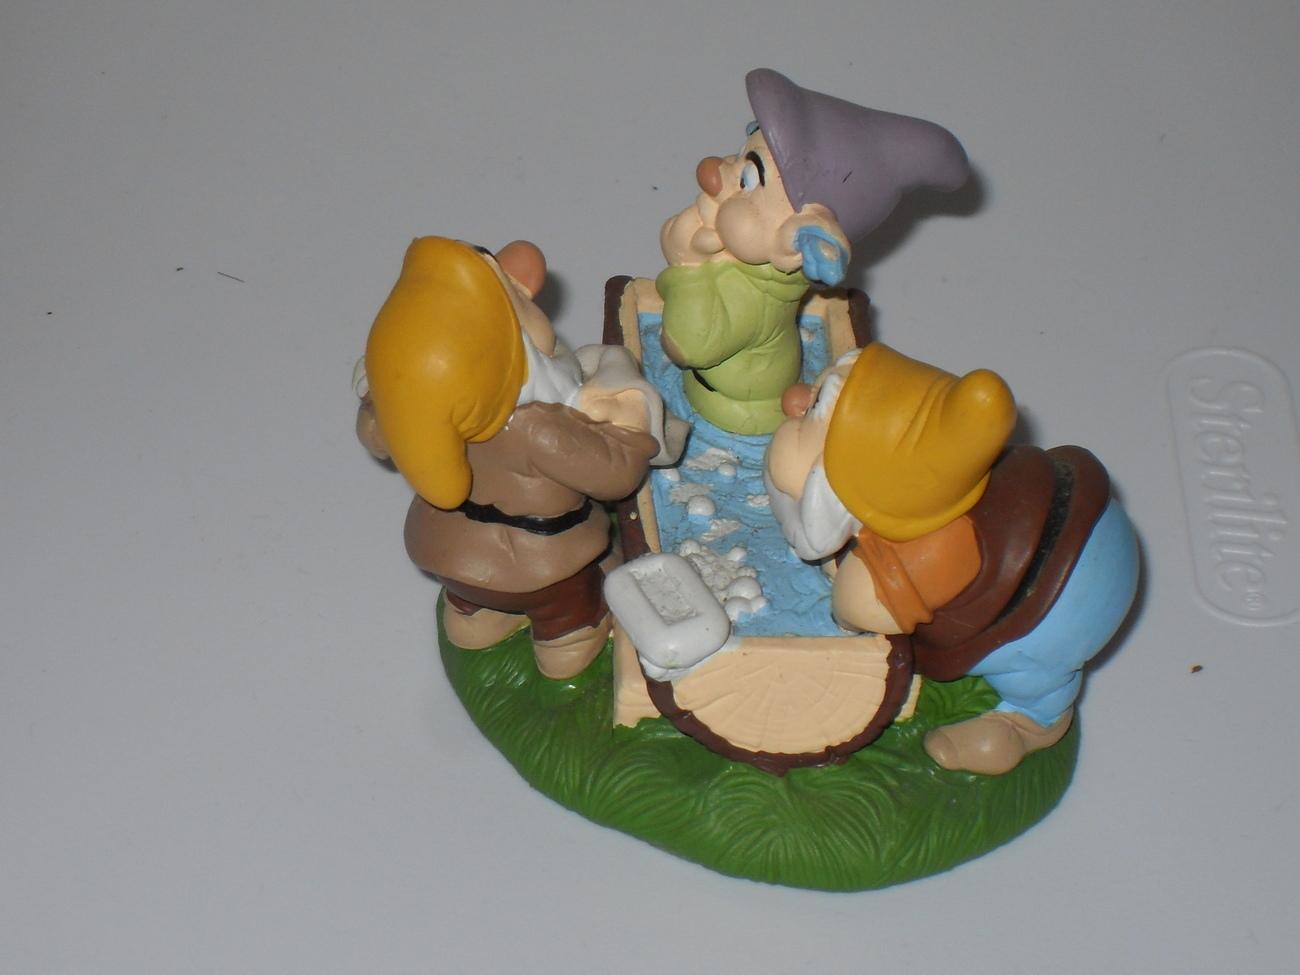 Disney Classics Snow White Dopey Getting Bath Figurine